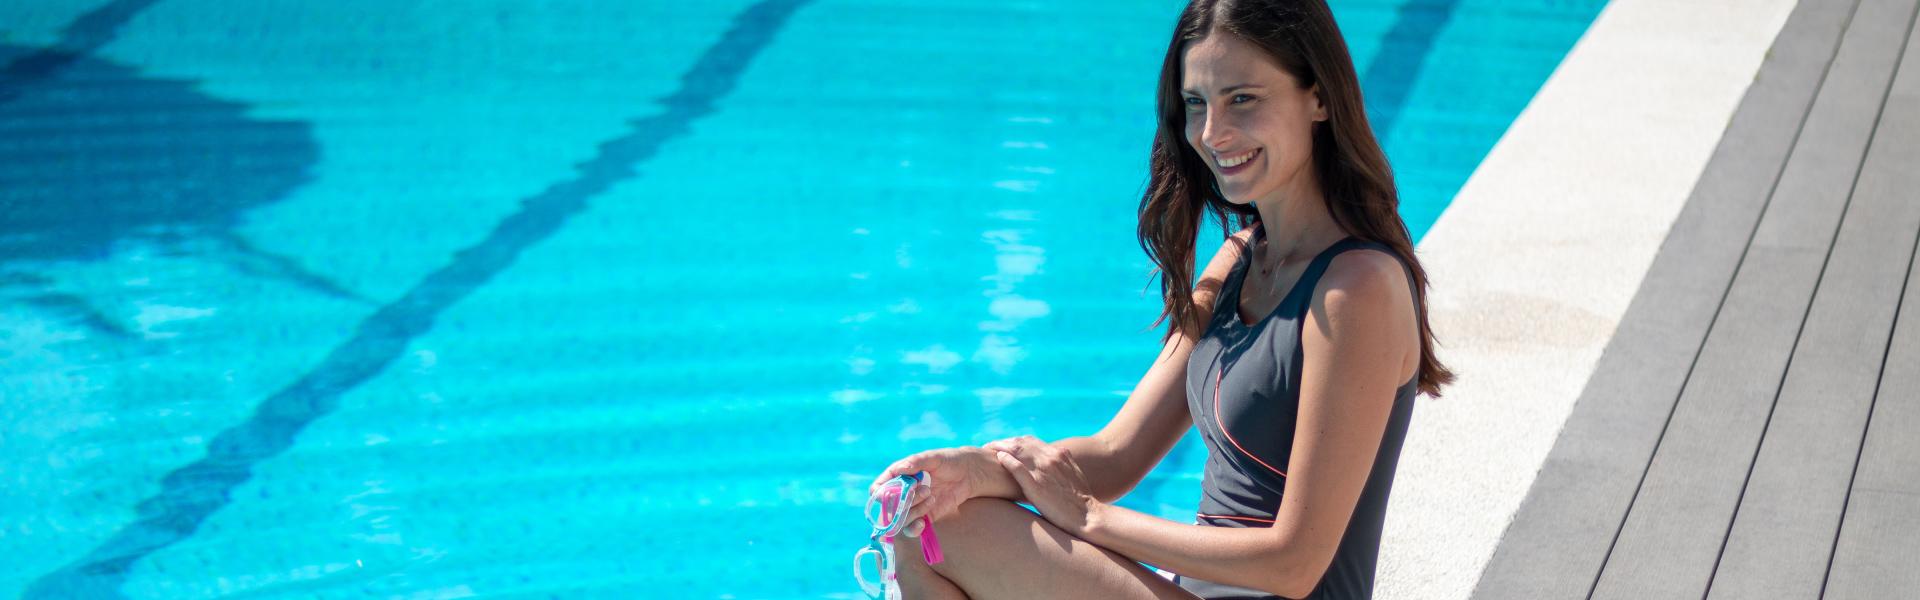 Training tips: Improve your swimming technique